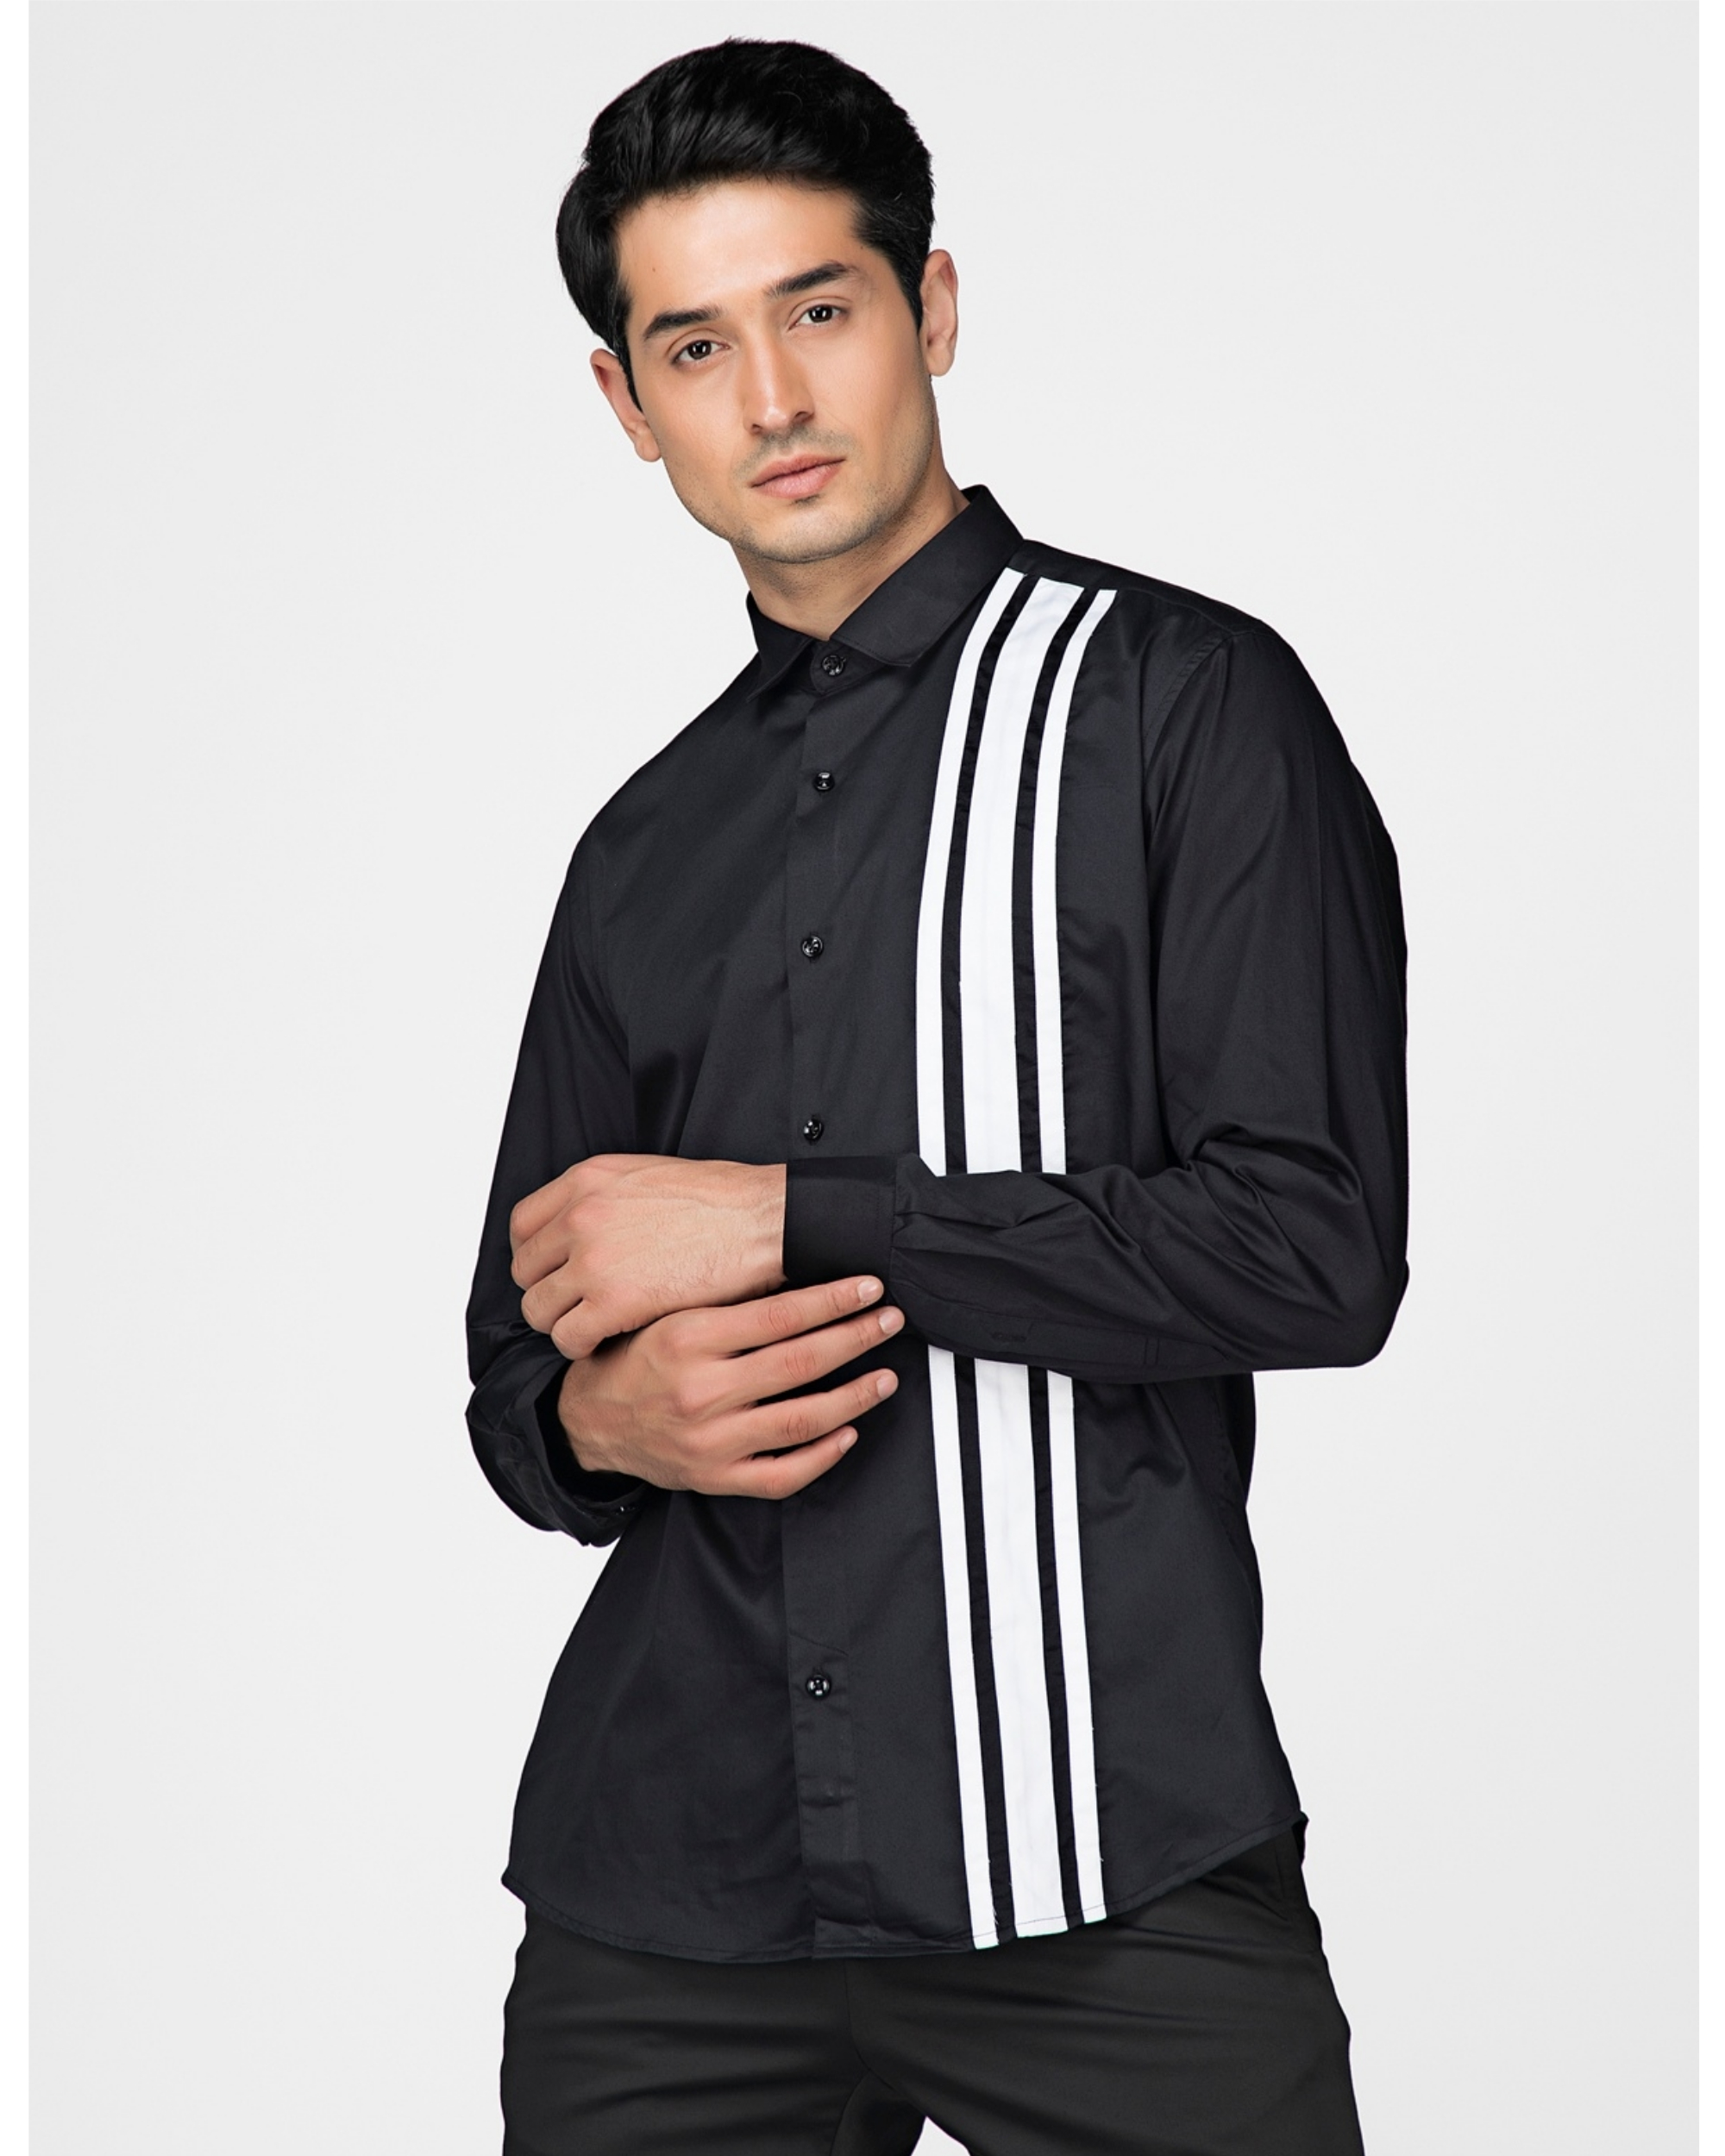 Black and white tri panels striped shirt